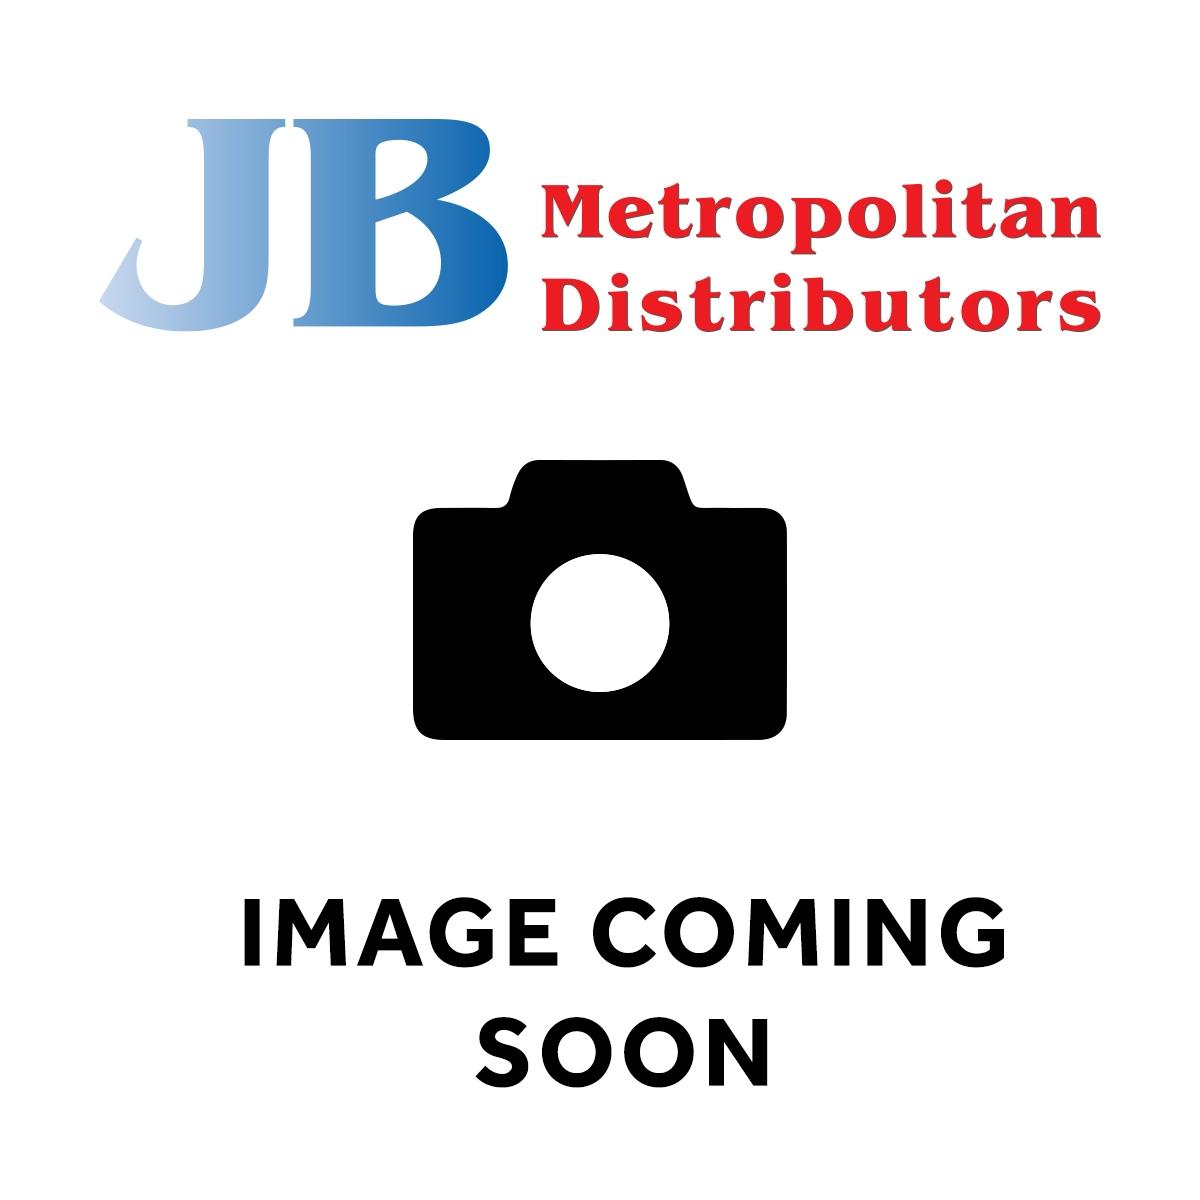 524ML 16OZ SAVILL HONOR CUP CLEAR PET